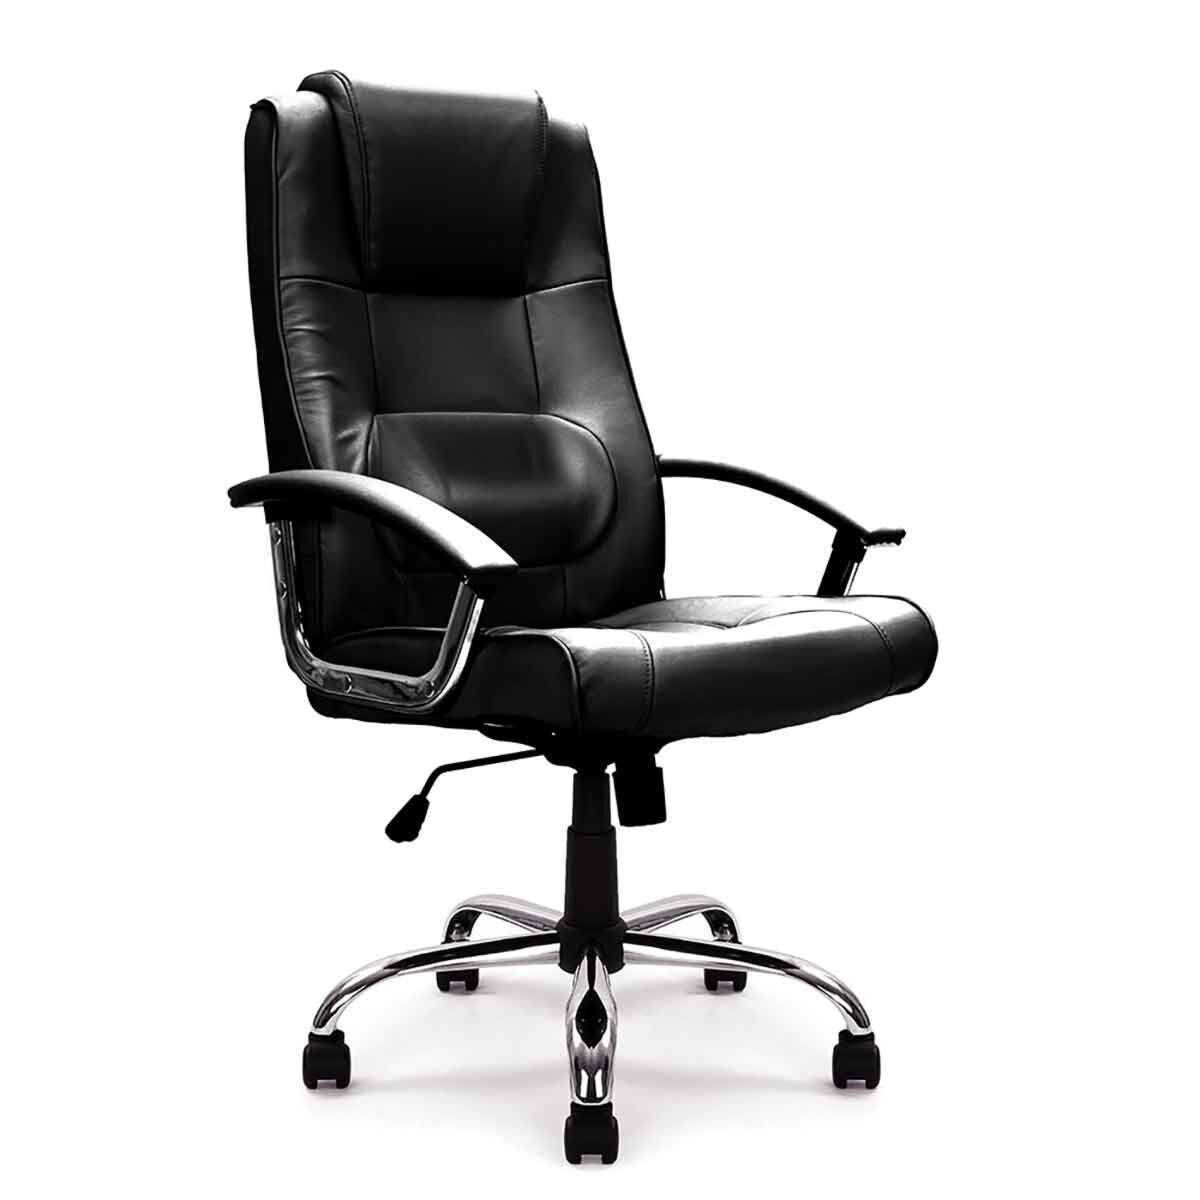 Somerset Executive High Back Chair